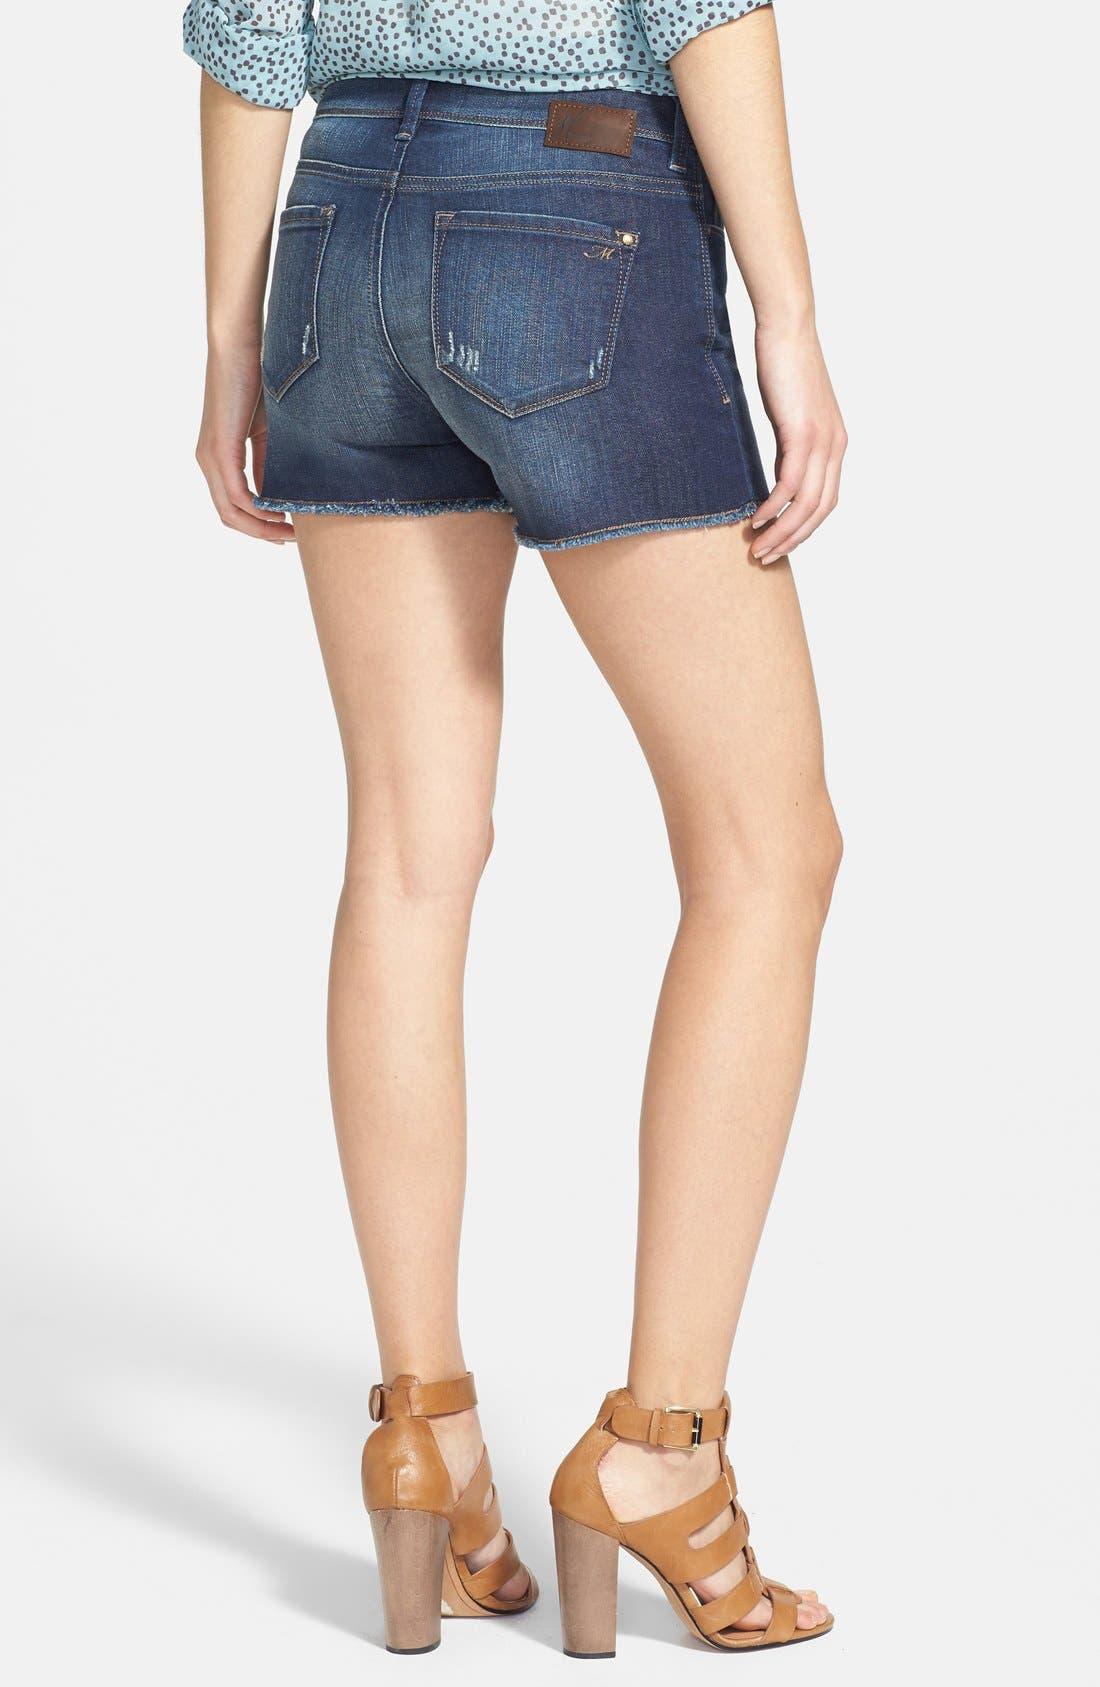 Alternate Image 2  - Mavi Jeans 'Emily' Cutoff Destroyed Denim Shorts (Vintage)